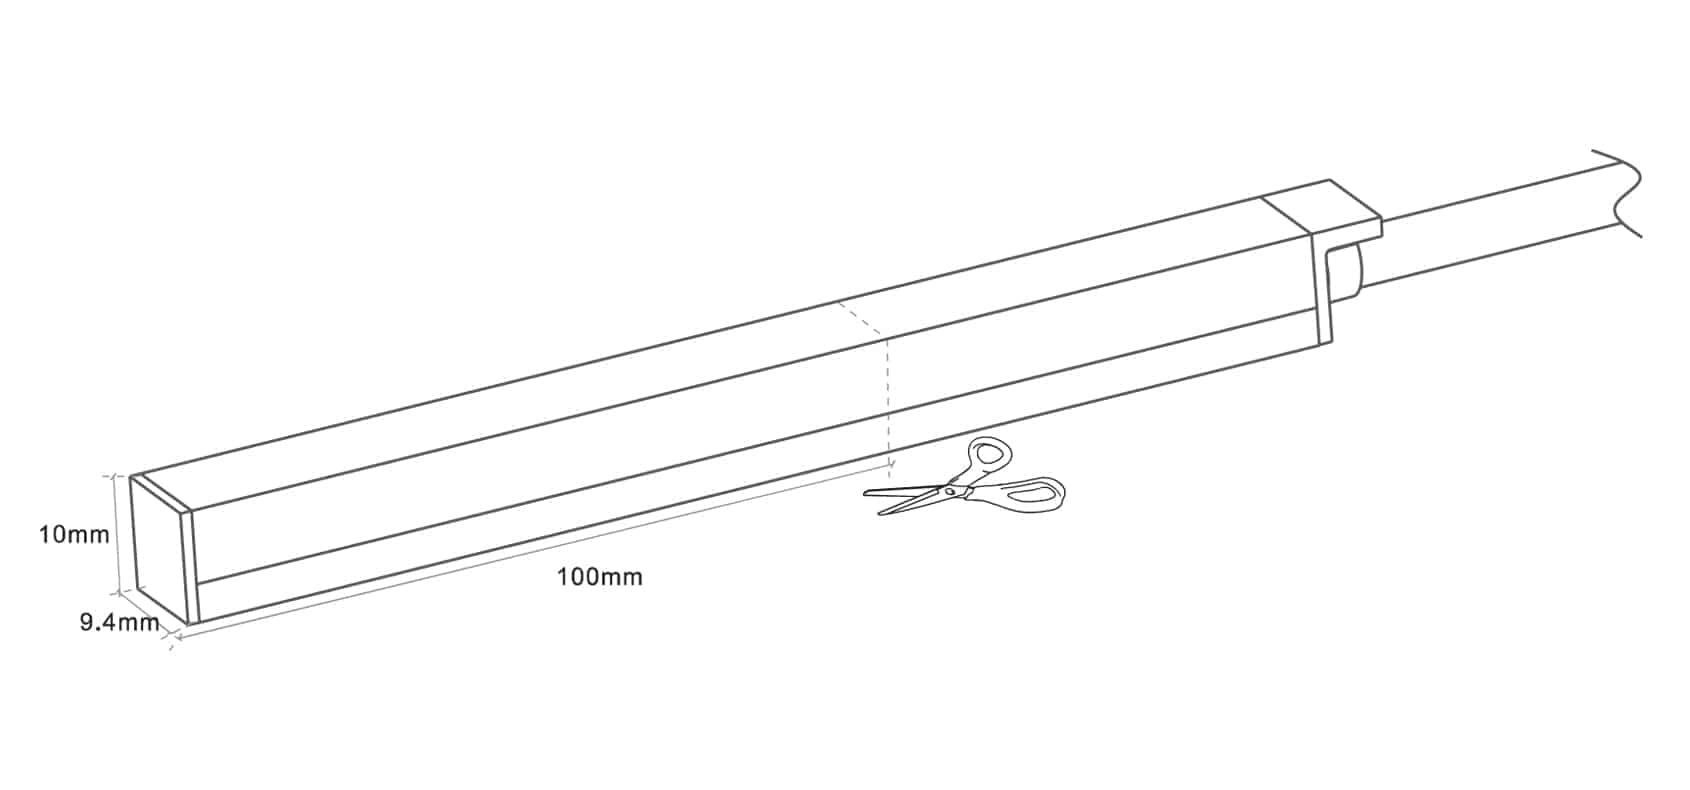 Neon-Flex-Slim Top Bend - 9.4x10mm - Single color - Dia